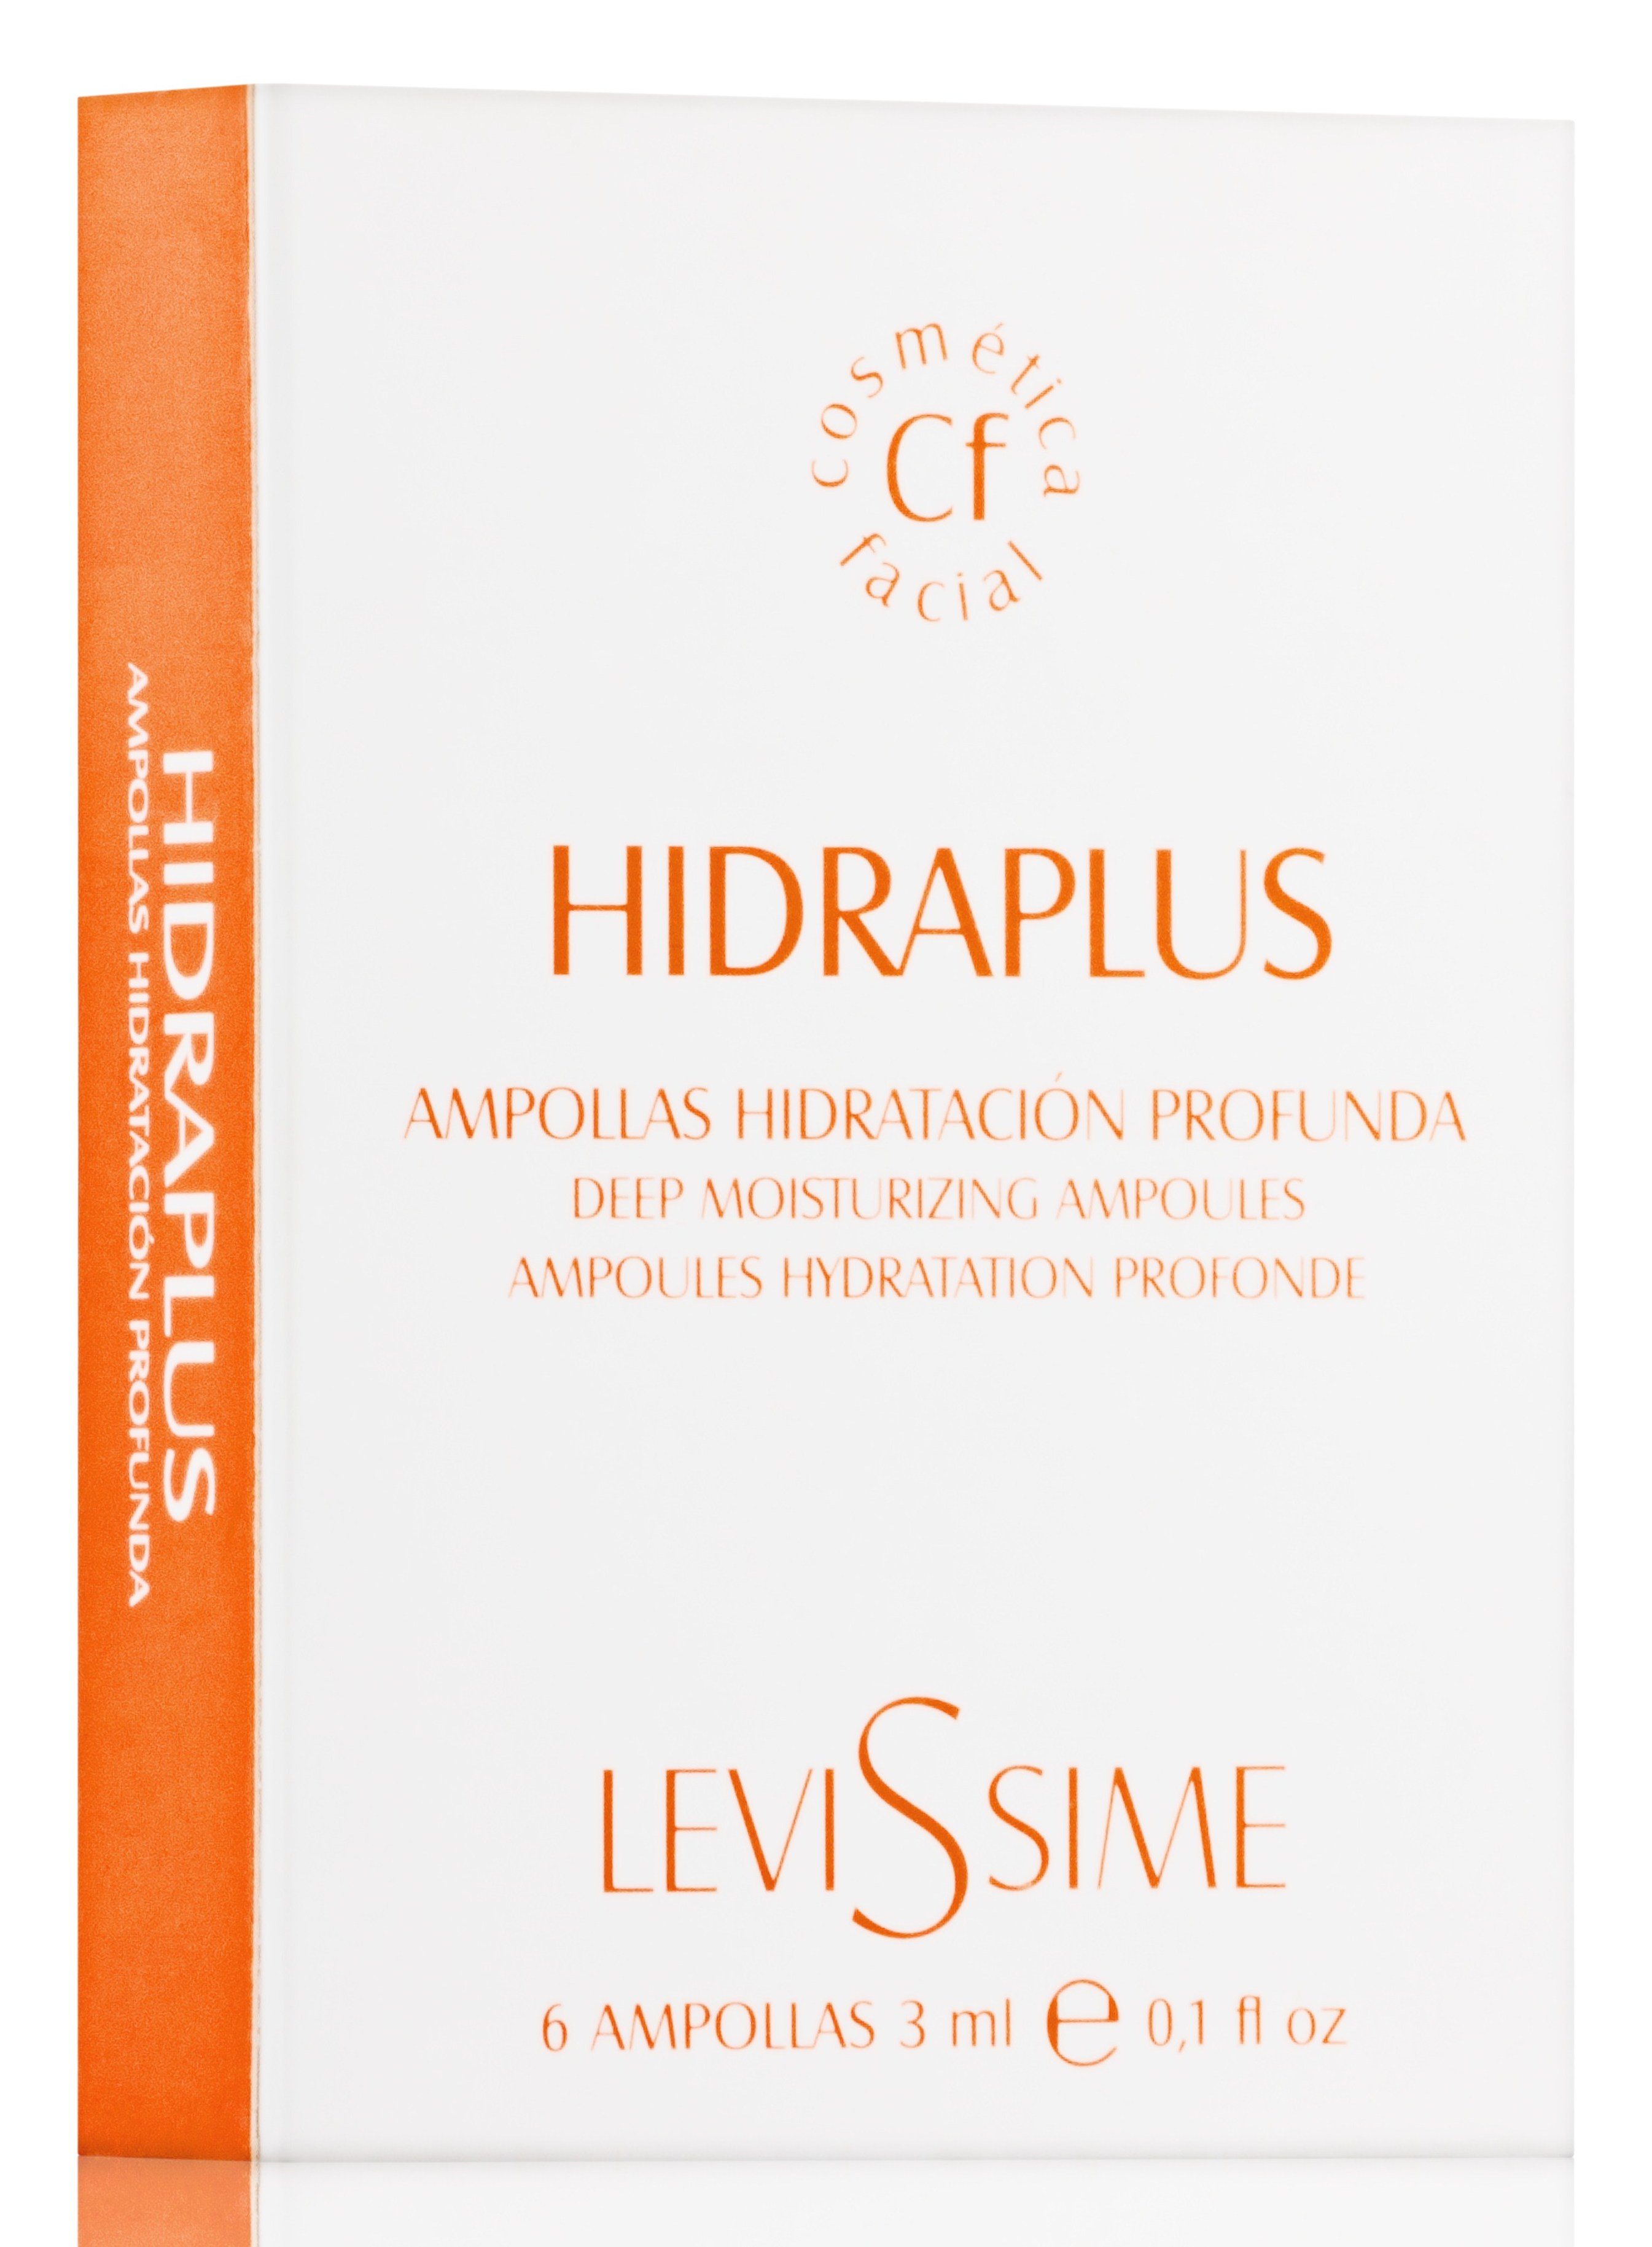 LEVISSIME Комплекс ревитализирующий / Hidraplus 6*3 мл - Ампулы